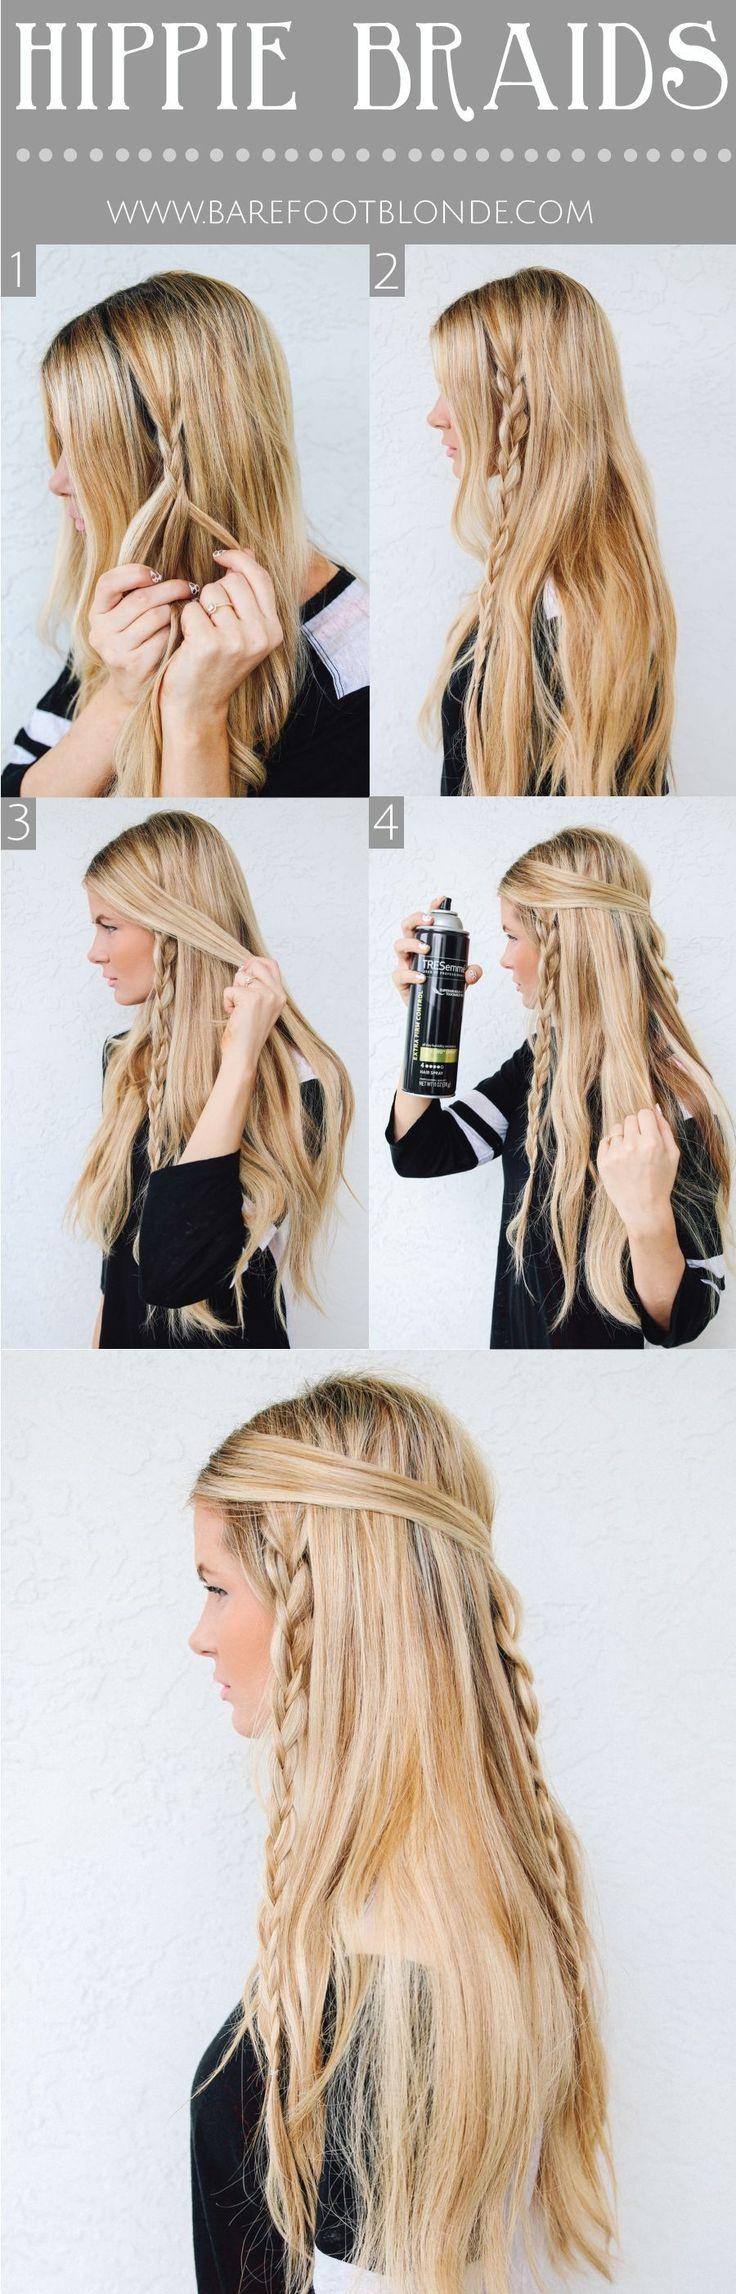 Phenomenal 1000 Ideas About Hippie Hair Short On Pinterest Short Hair Short Hairstyles Gunalazisus